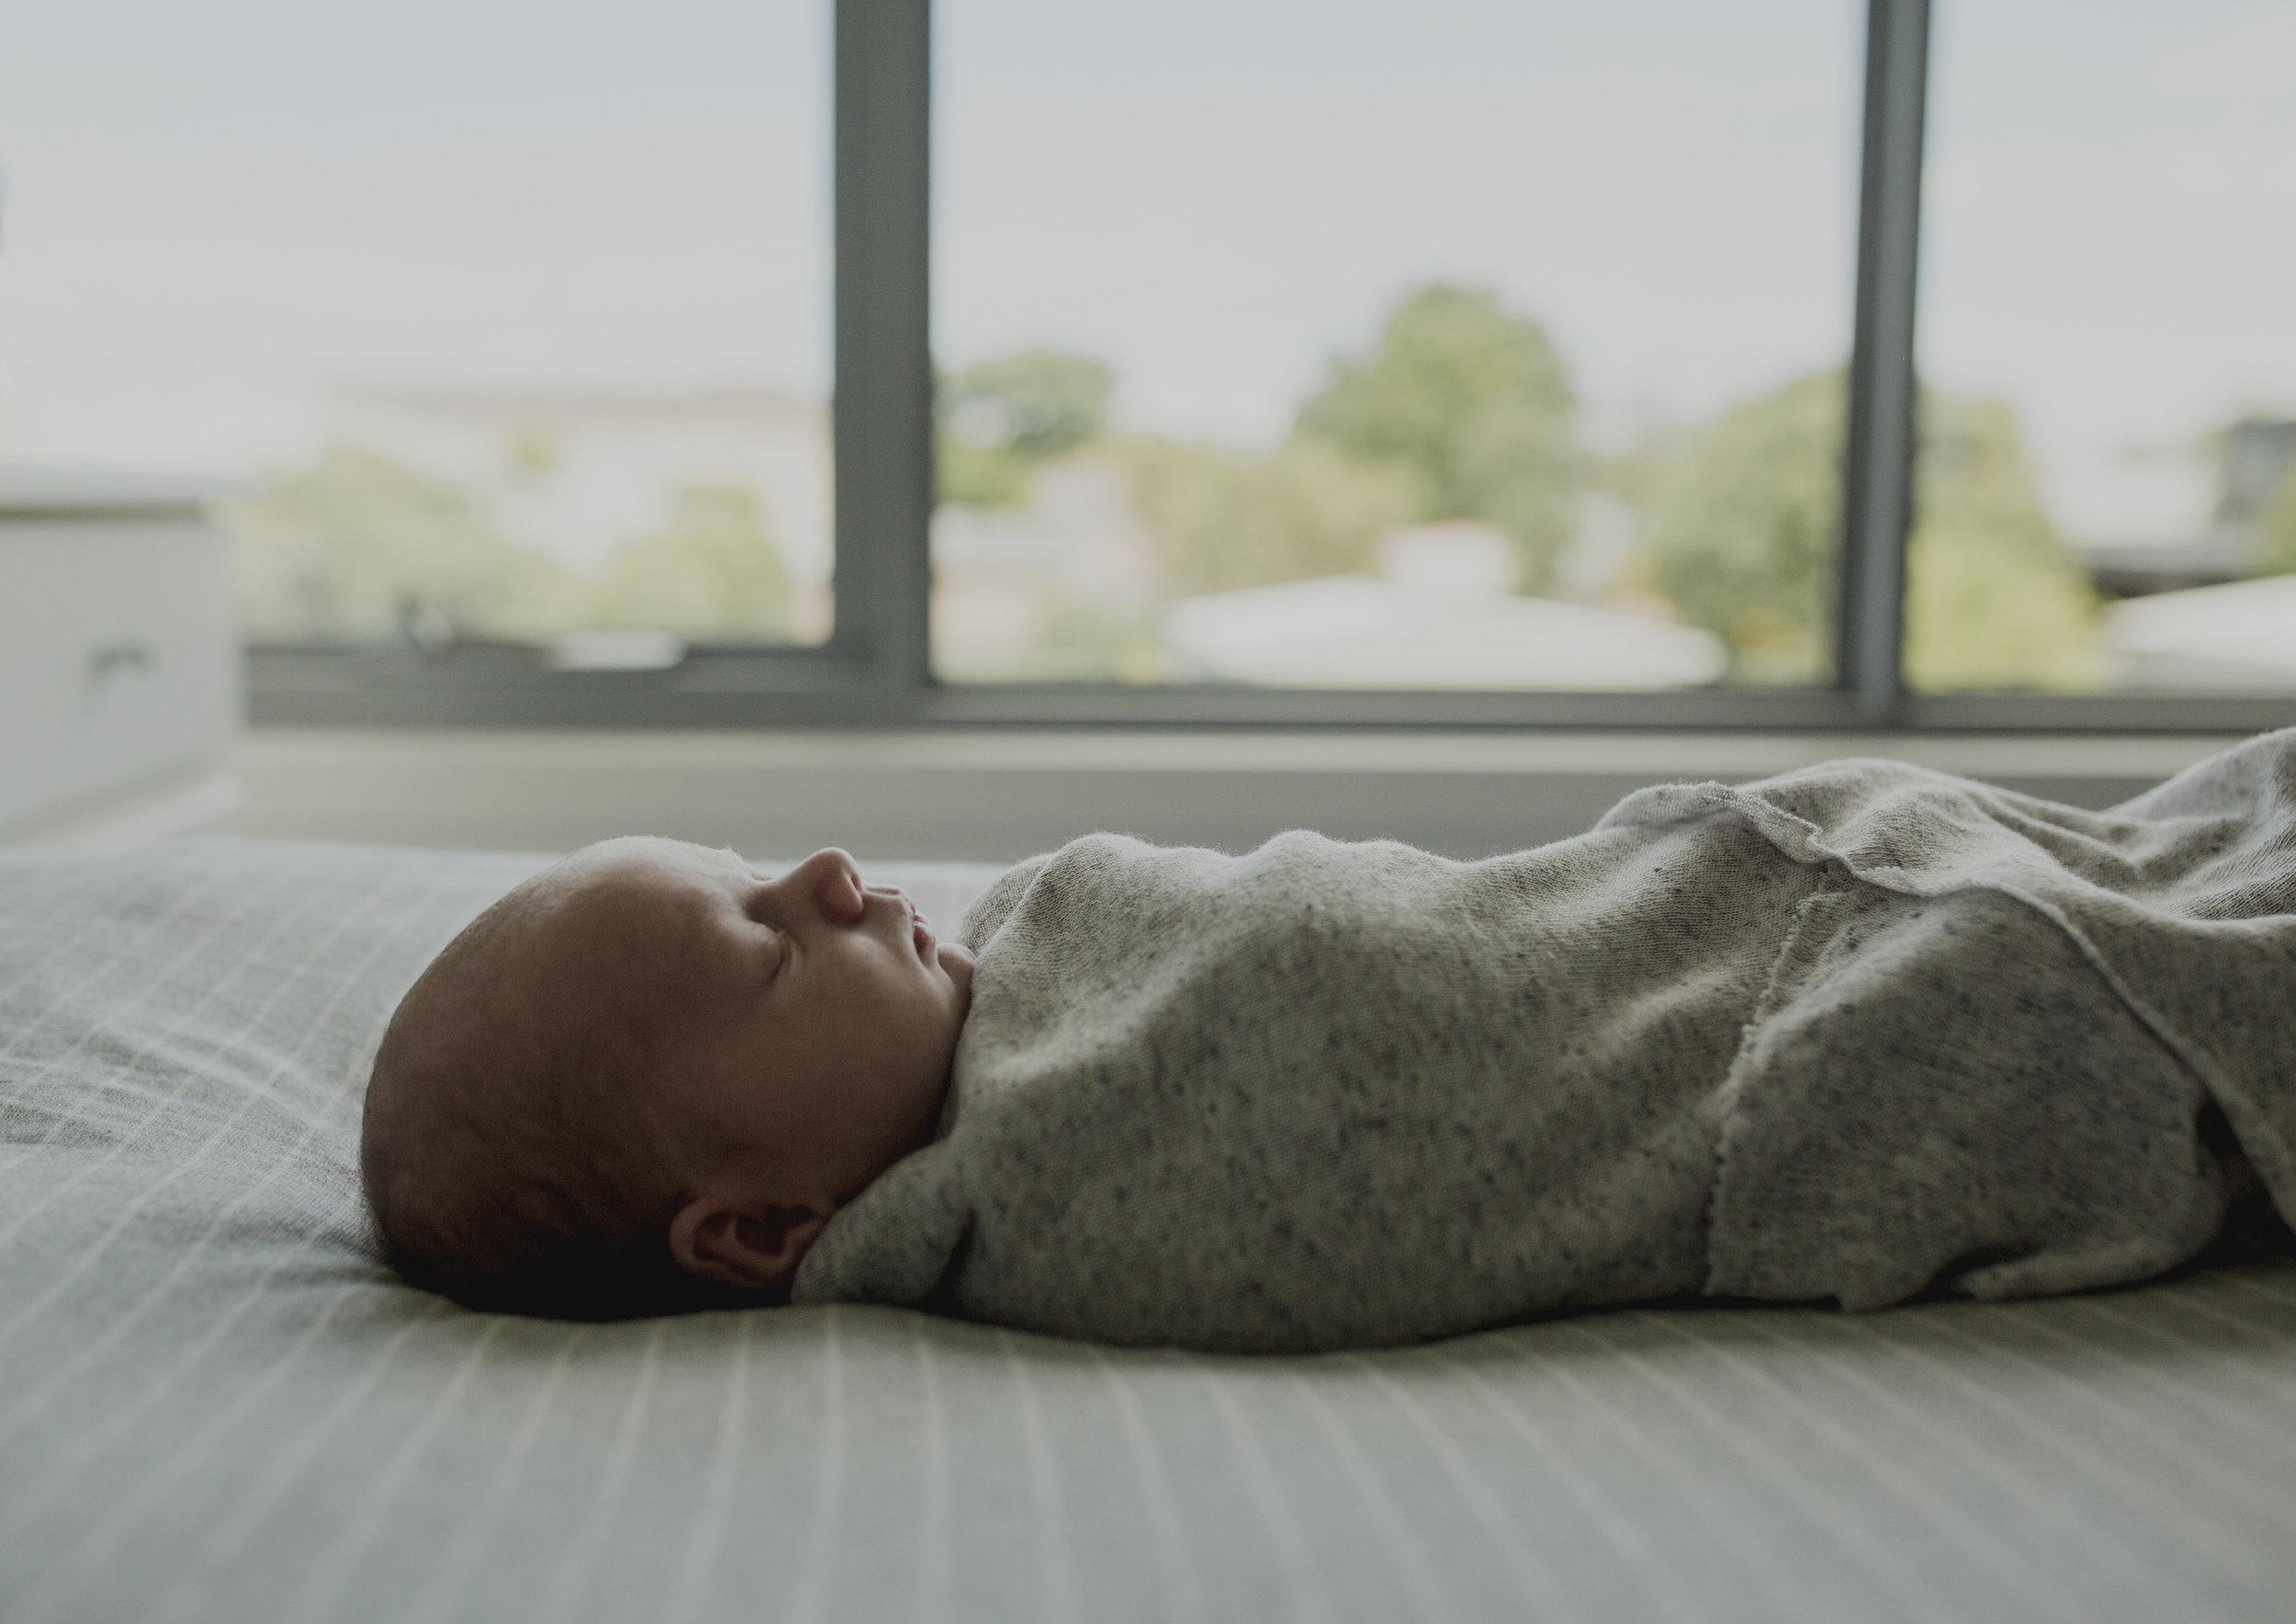 Newborn baby boy sleeping on his parent's bed